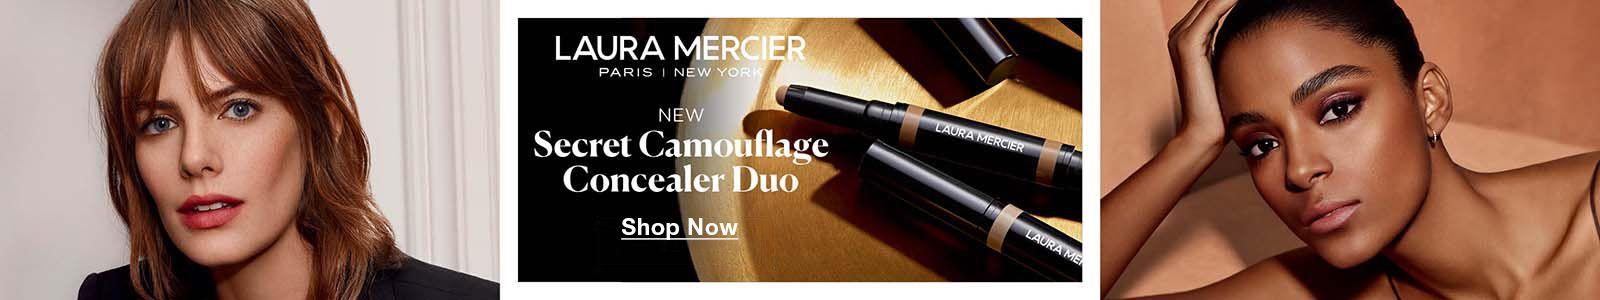 Laura Mercier, Paris, New York, New, Secret Camouflage concealer duo, Shop Now